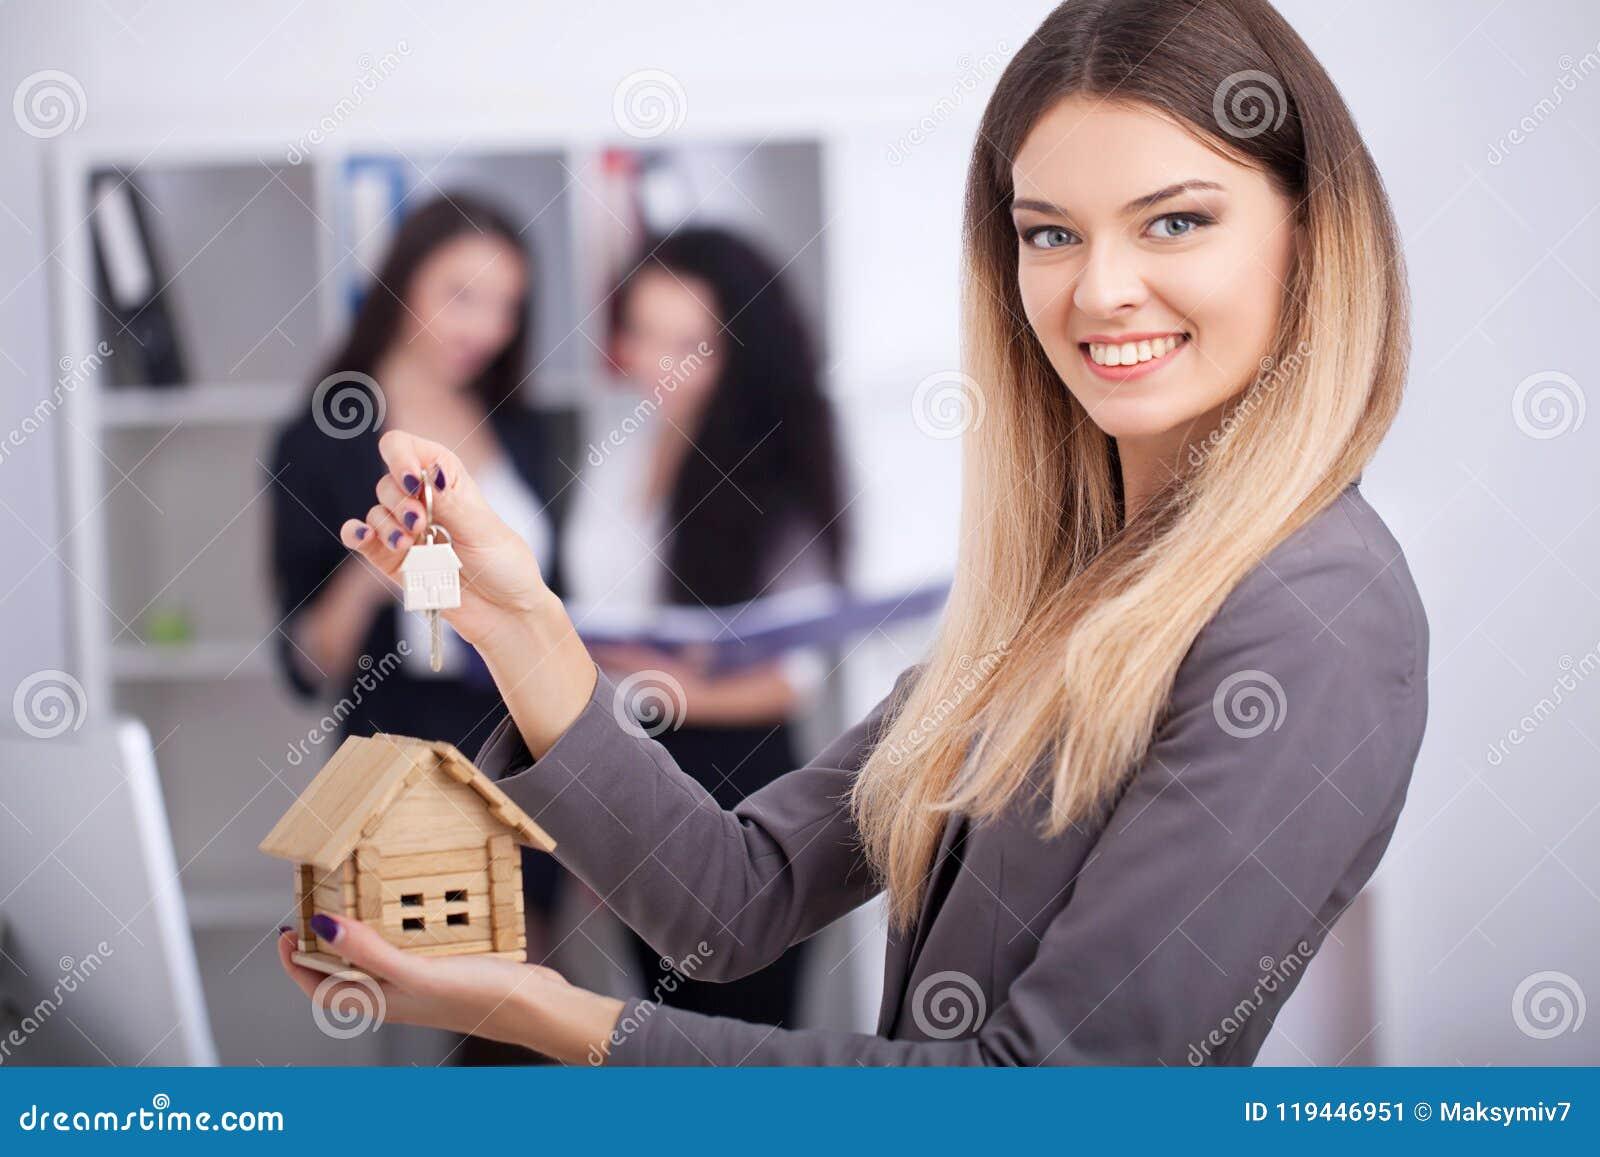 Incontrando agente in ufficio, comprando affittando appartamento o casa,